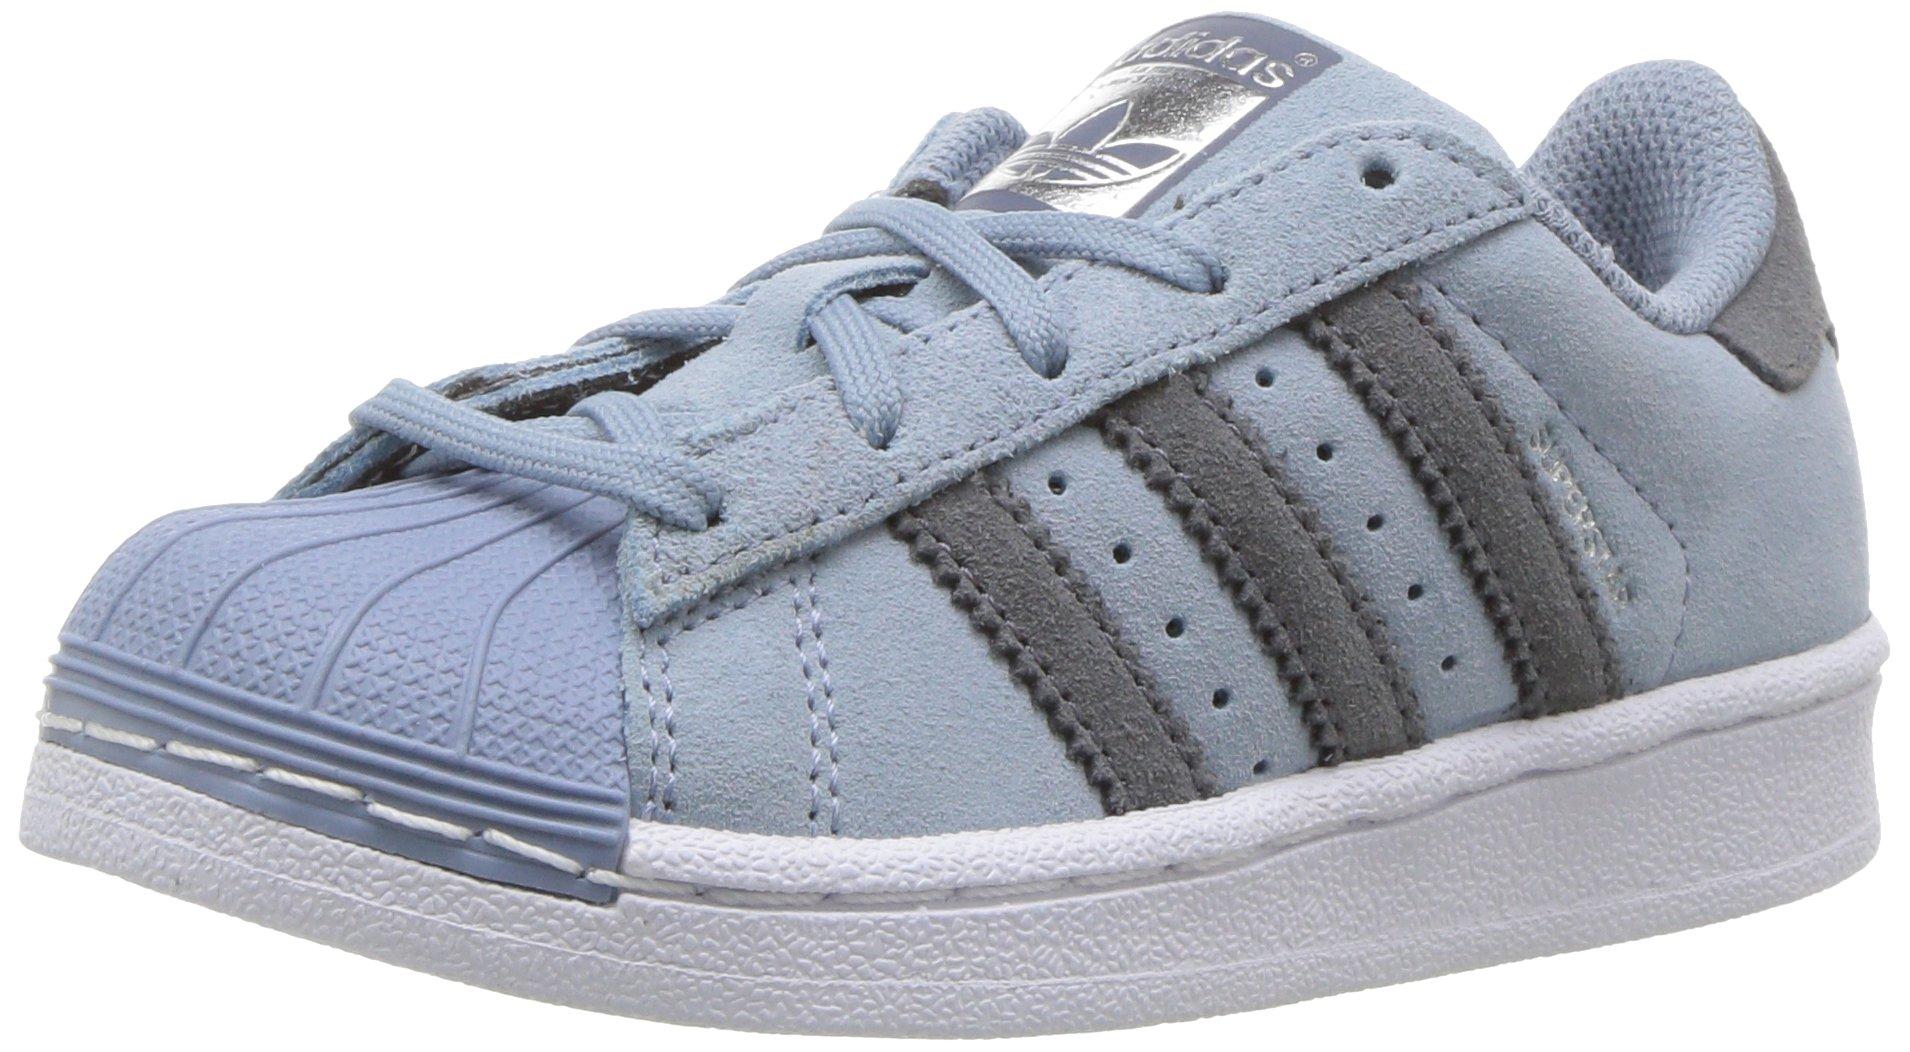 huge discount cb135 00b7c adidas Originals Boys' Superstar C Running Shoe, Tactile Blue Onix, 11  Medium US Little Kid